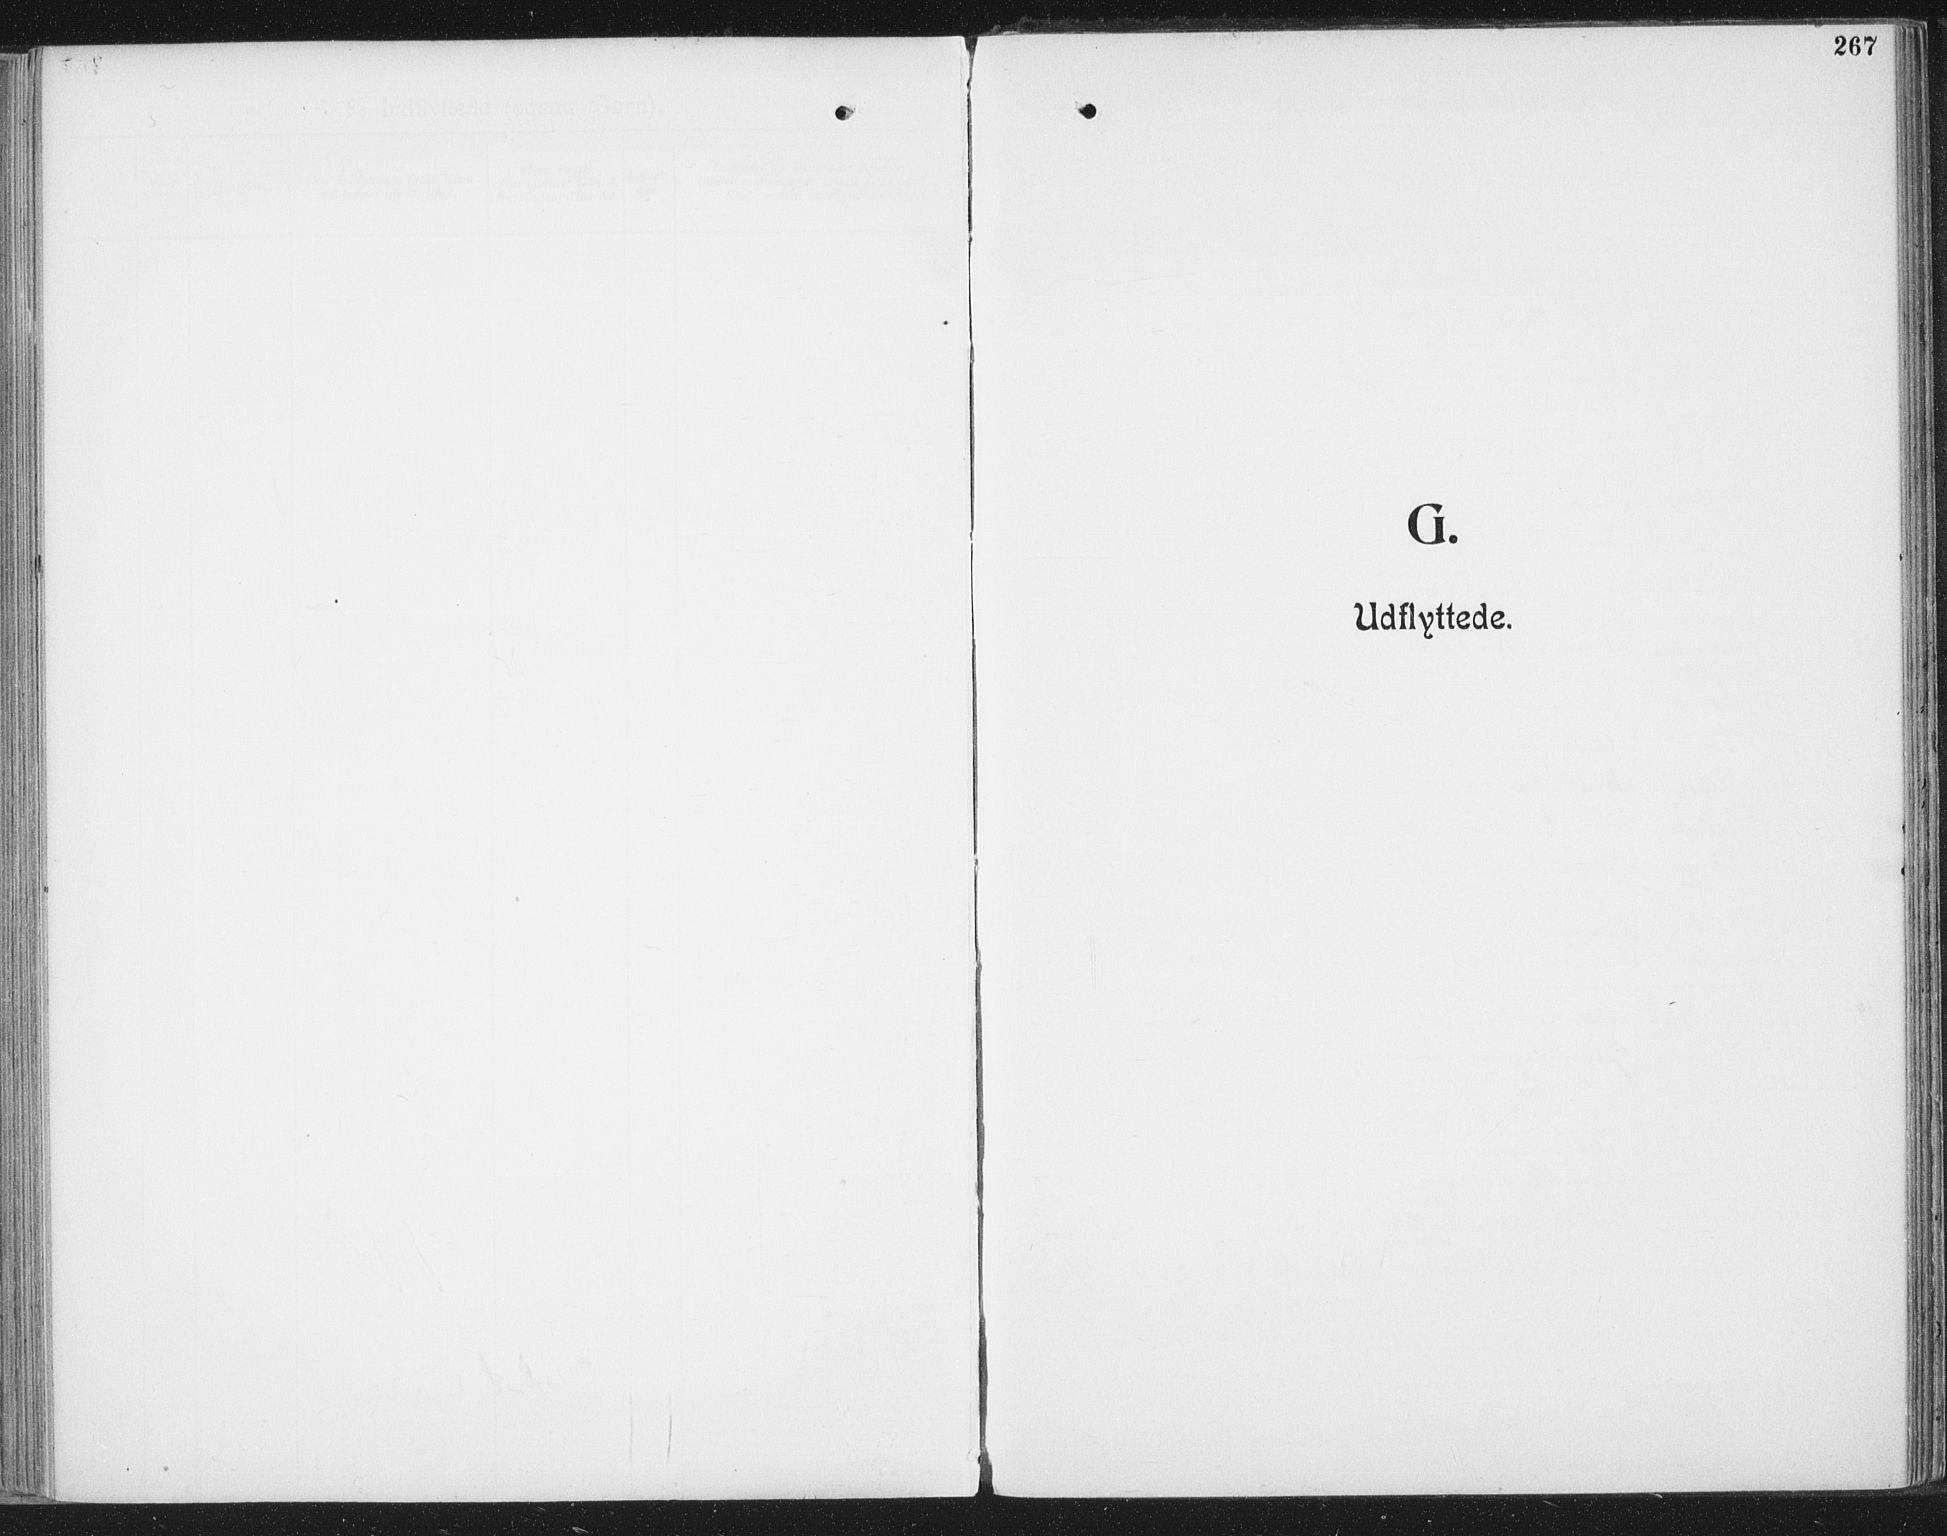 SAT, Ministerialprotokoller, klokkerbøker og fødselsregistre - Nordland, 804/L0081: Ministerialbok nr. 804A02, 1901-1915, s. 267